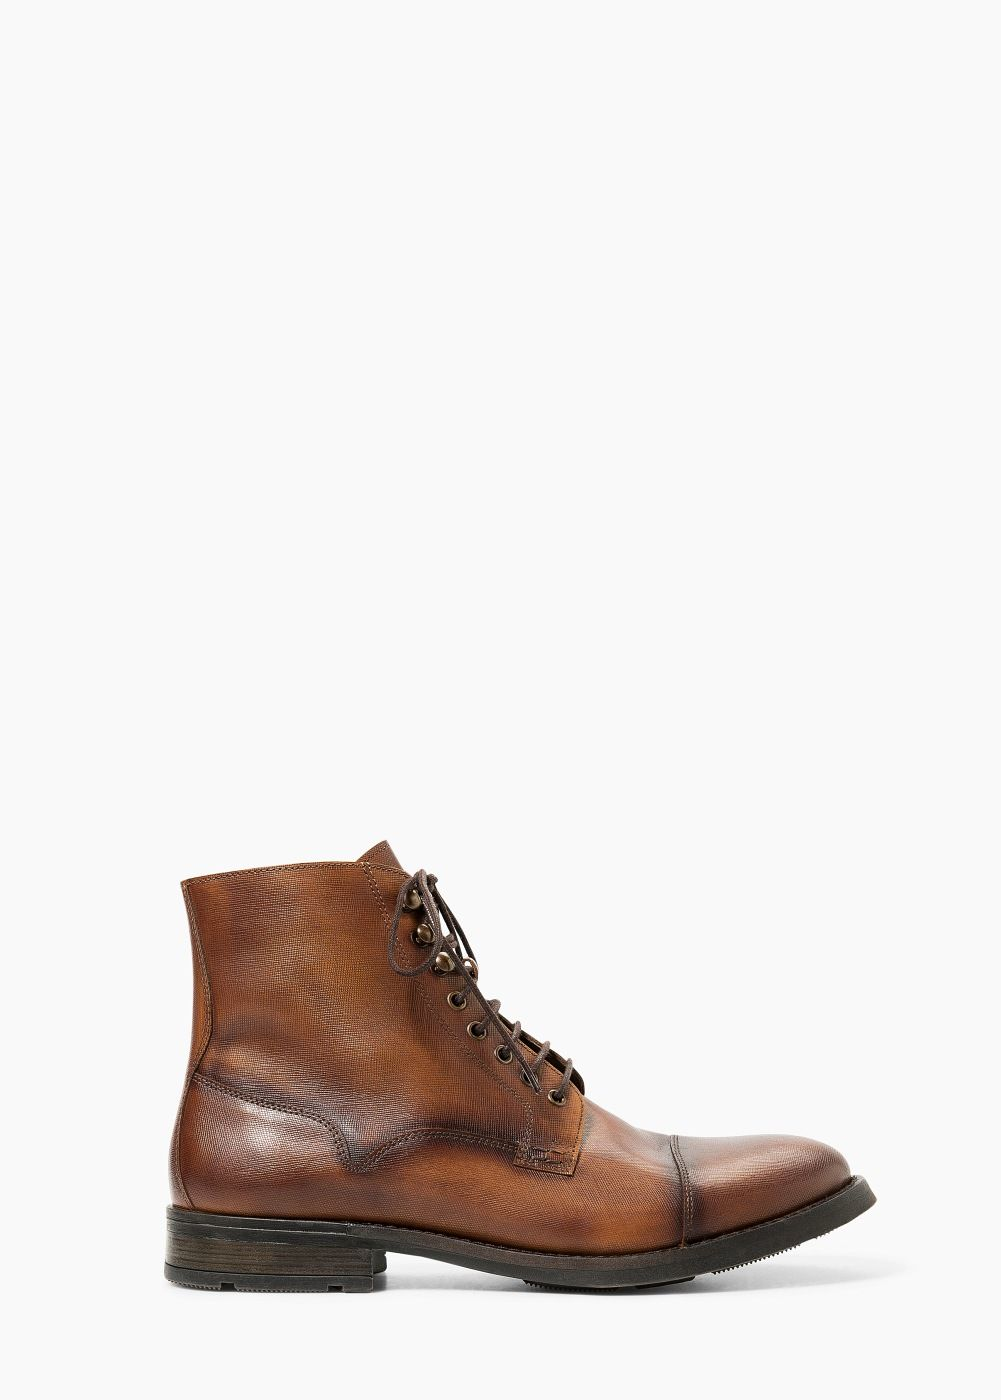 9834bd8fbfb8bd Leren laarzen - Schoenen voor Heren | MANGO Bottes Cuir, Chaussures Homme,  Chaussure Mode